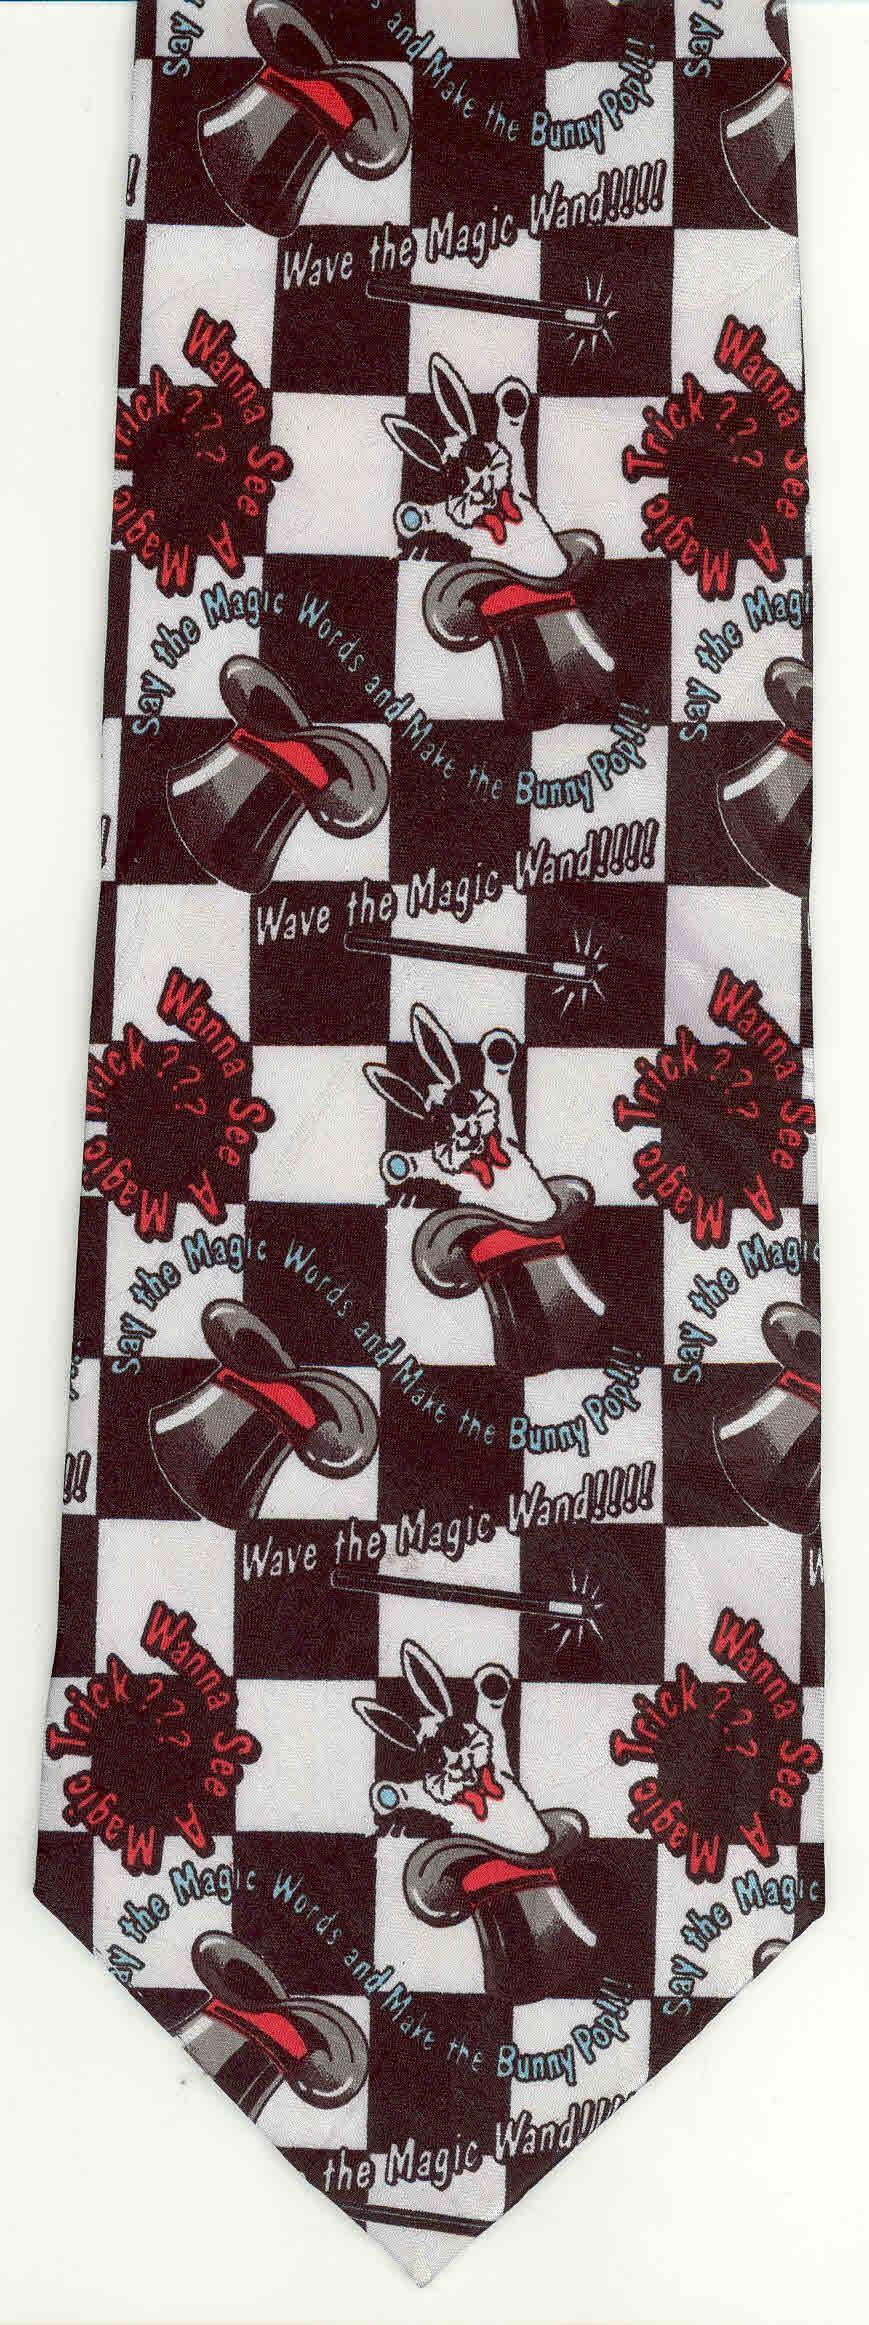 028 Checker Board.jpg